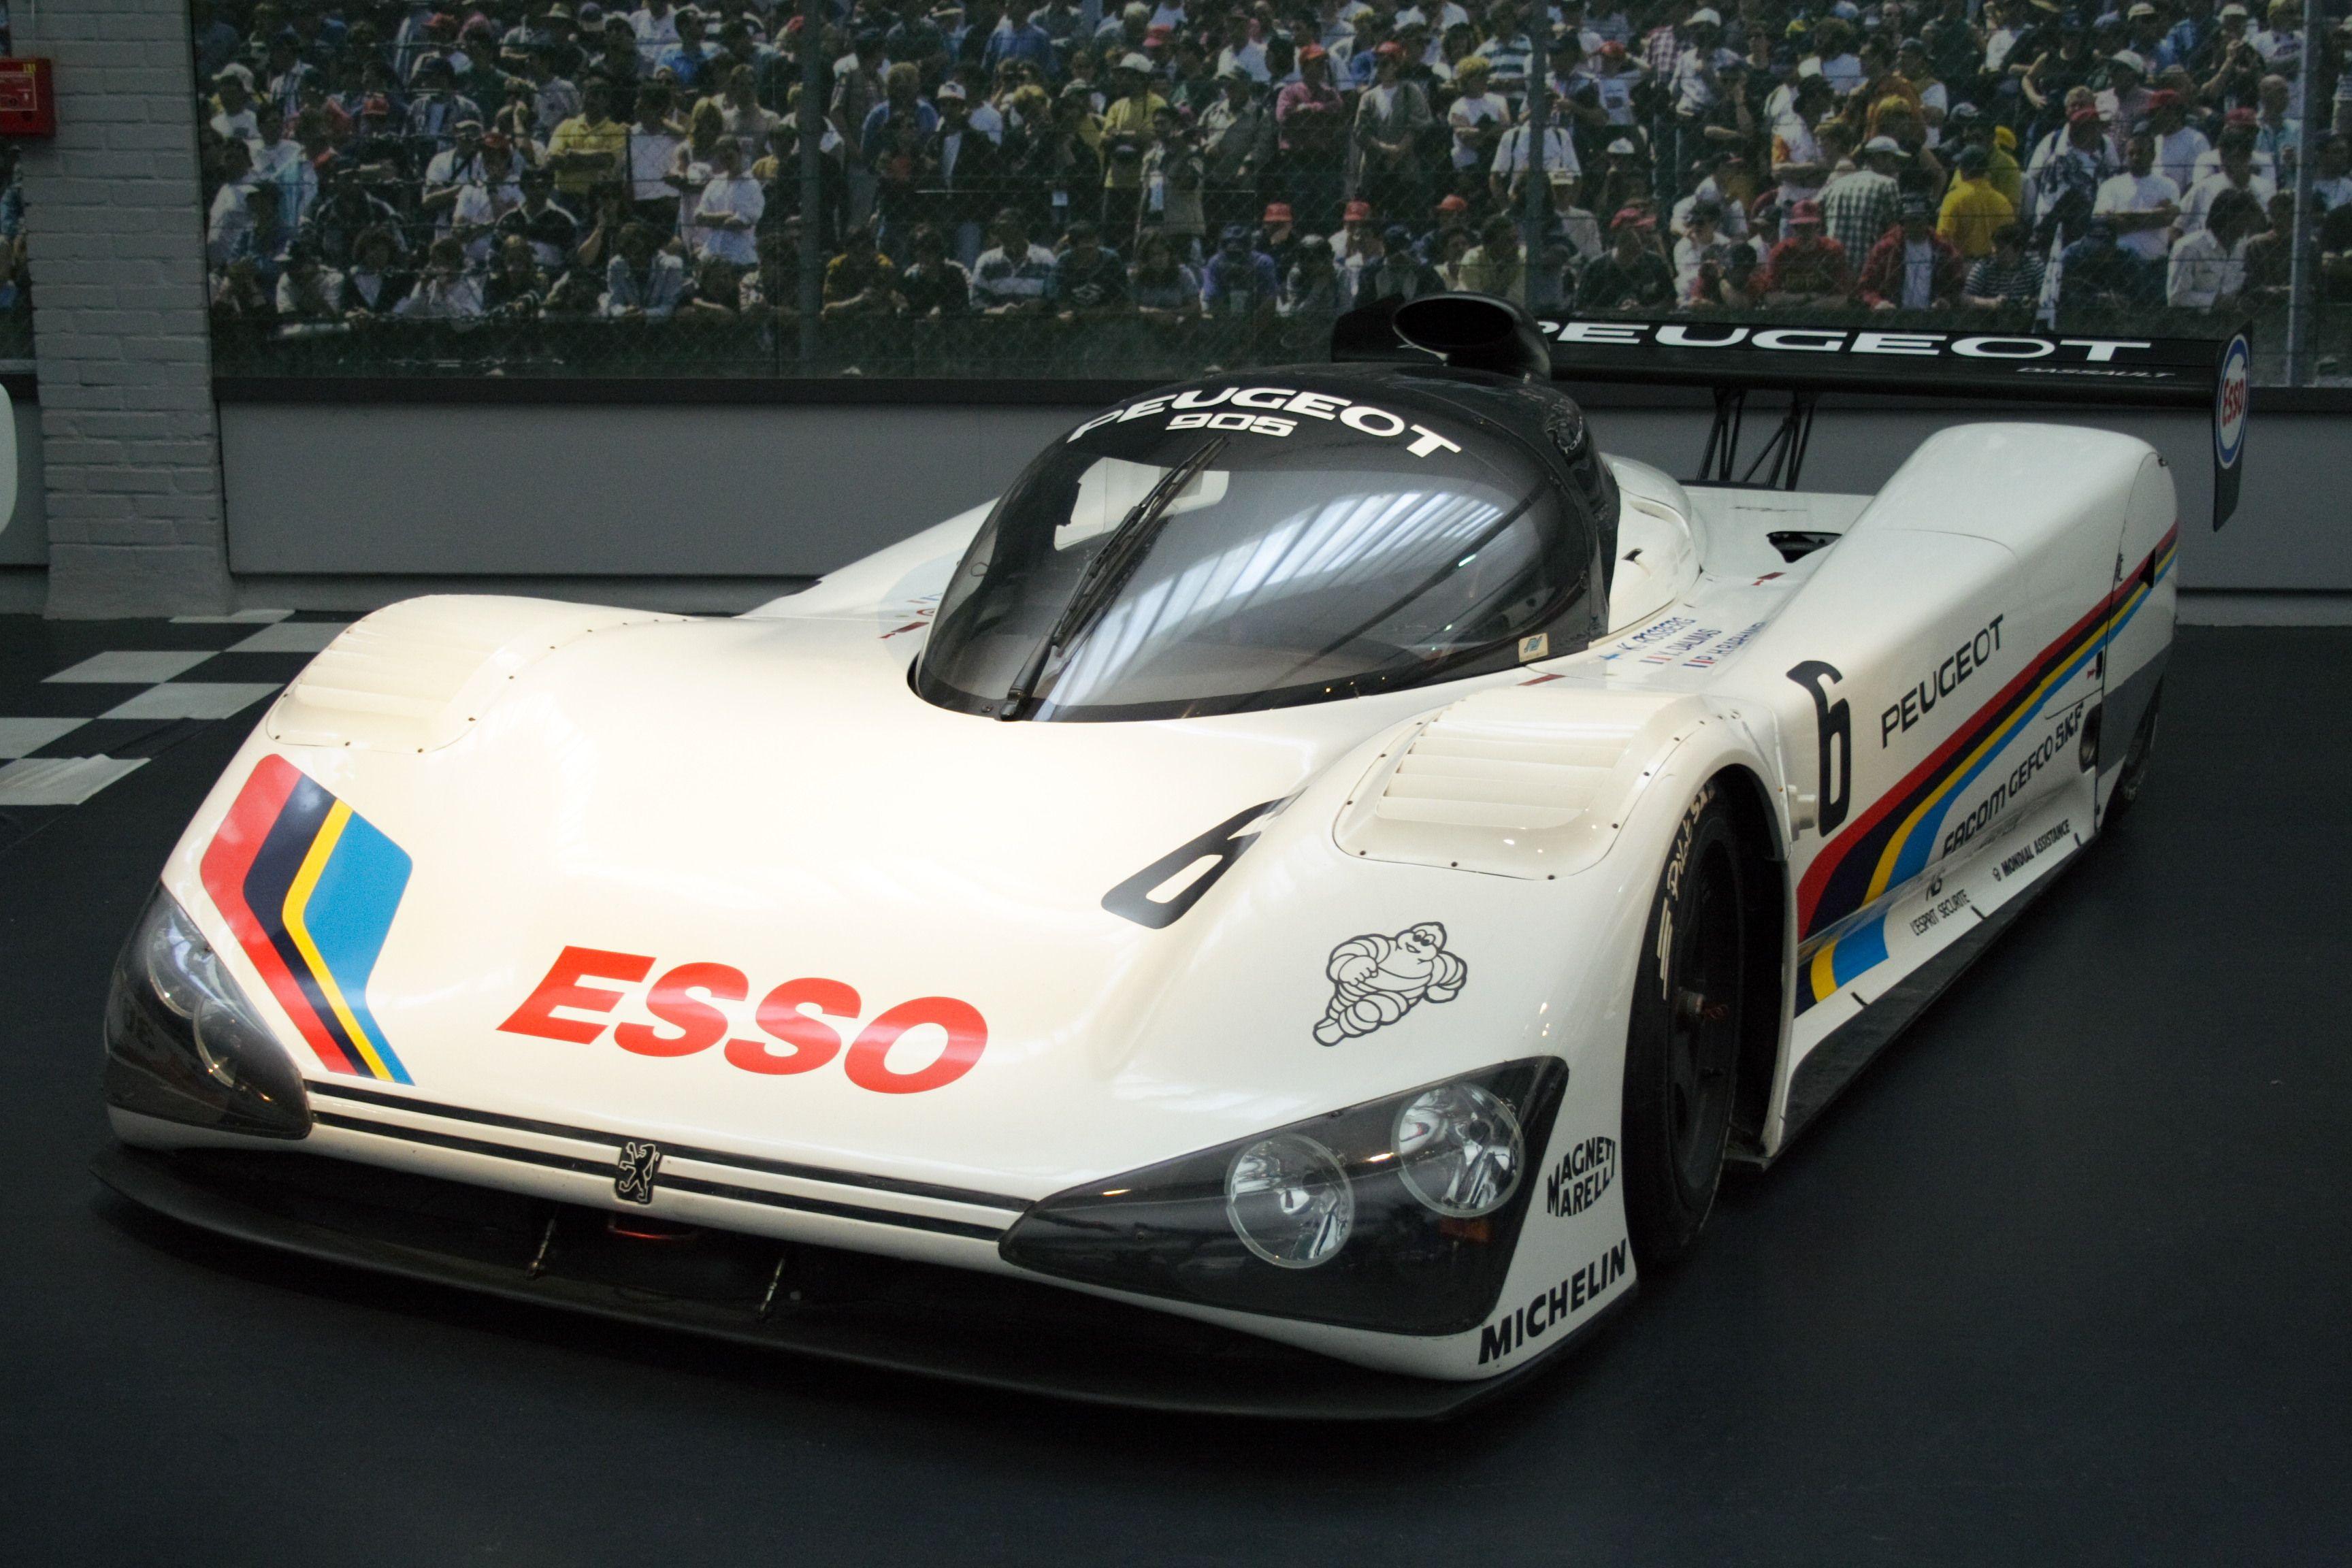 b22589eaf8d4dcf065f9658cfd43bc43 Outstanding Maisto Porsche 911 Gt1 Le Mans 1998 Cars Trend